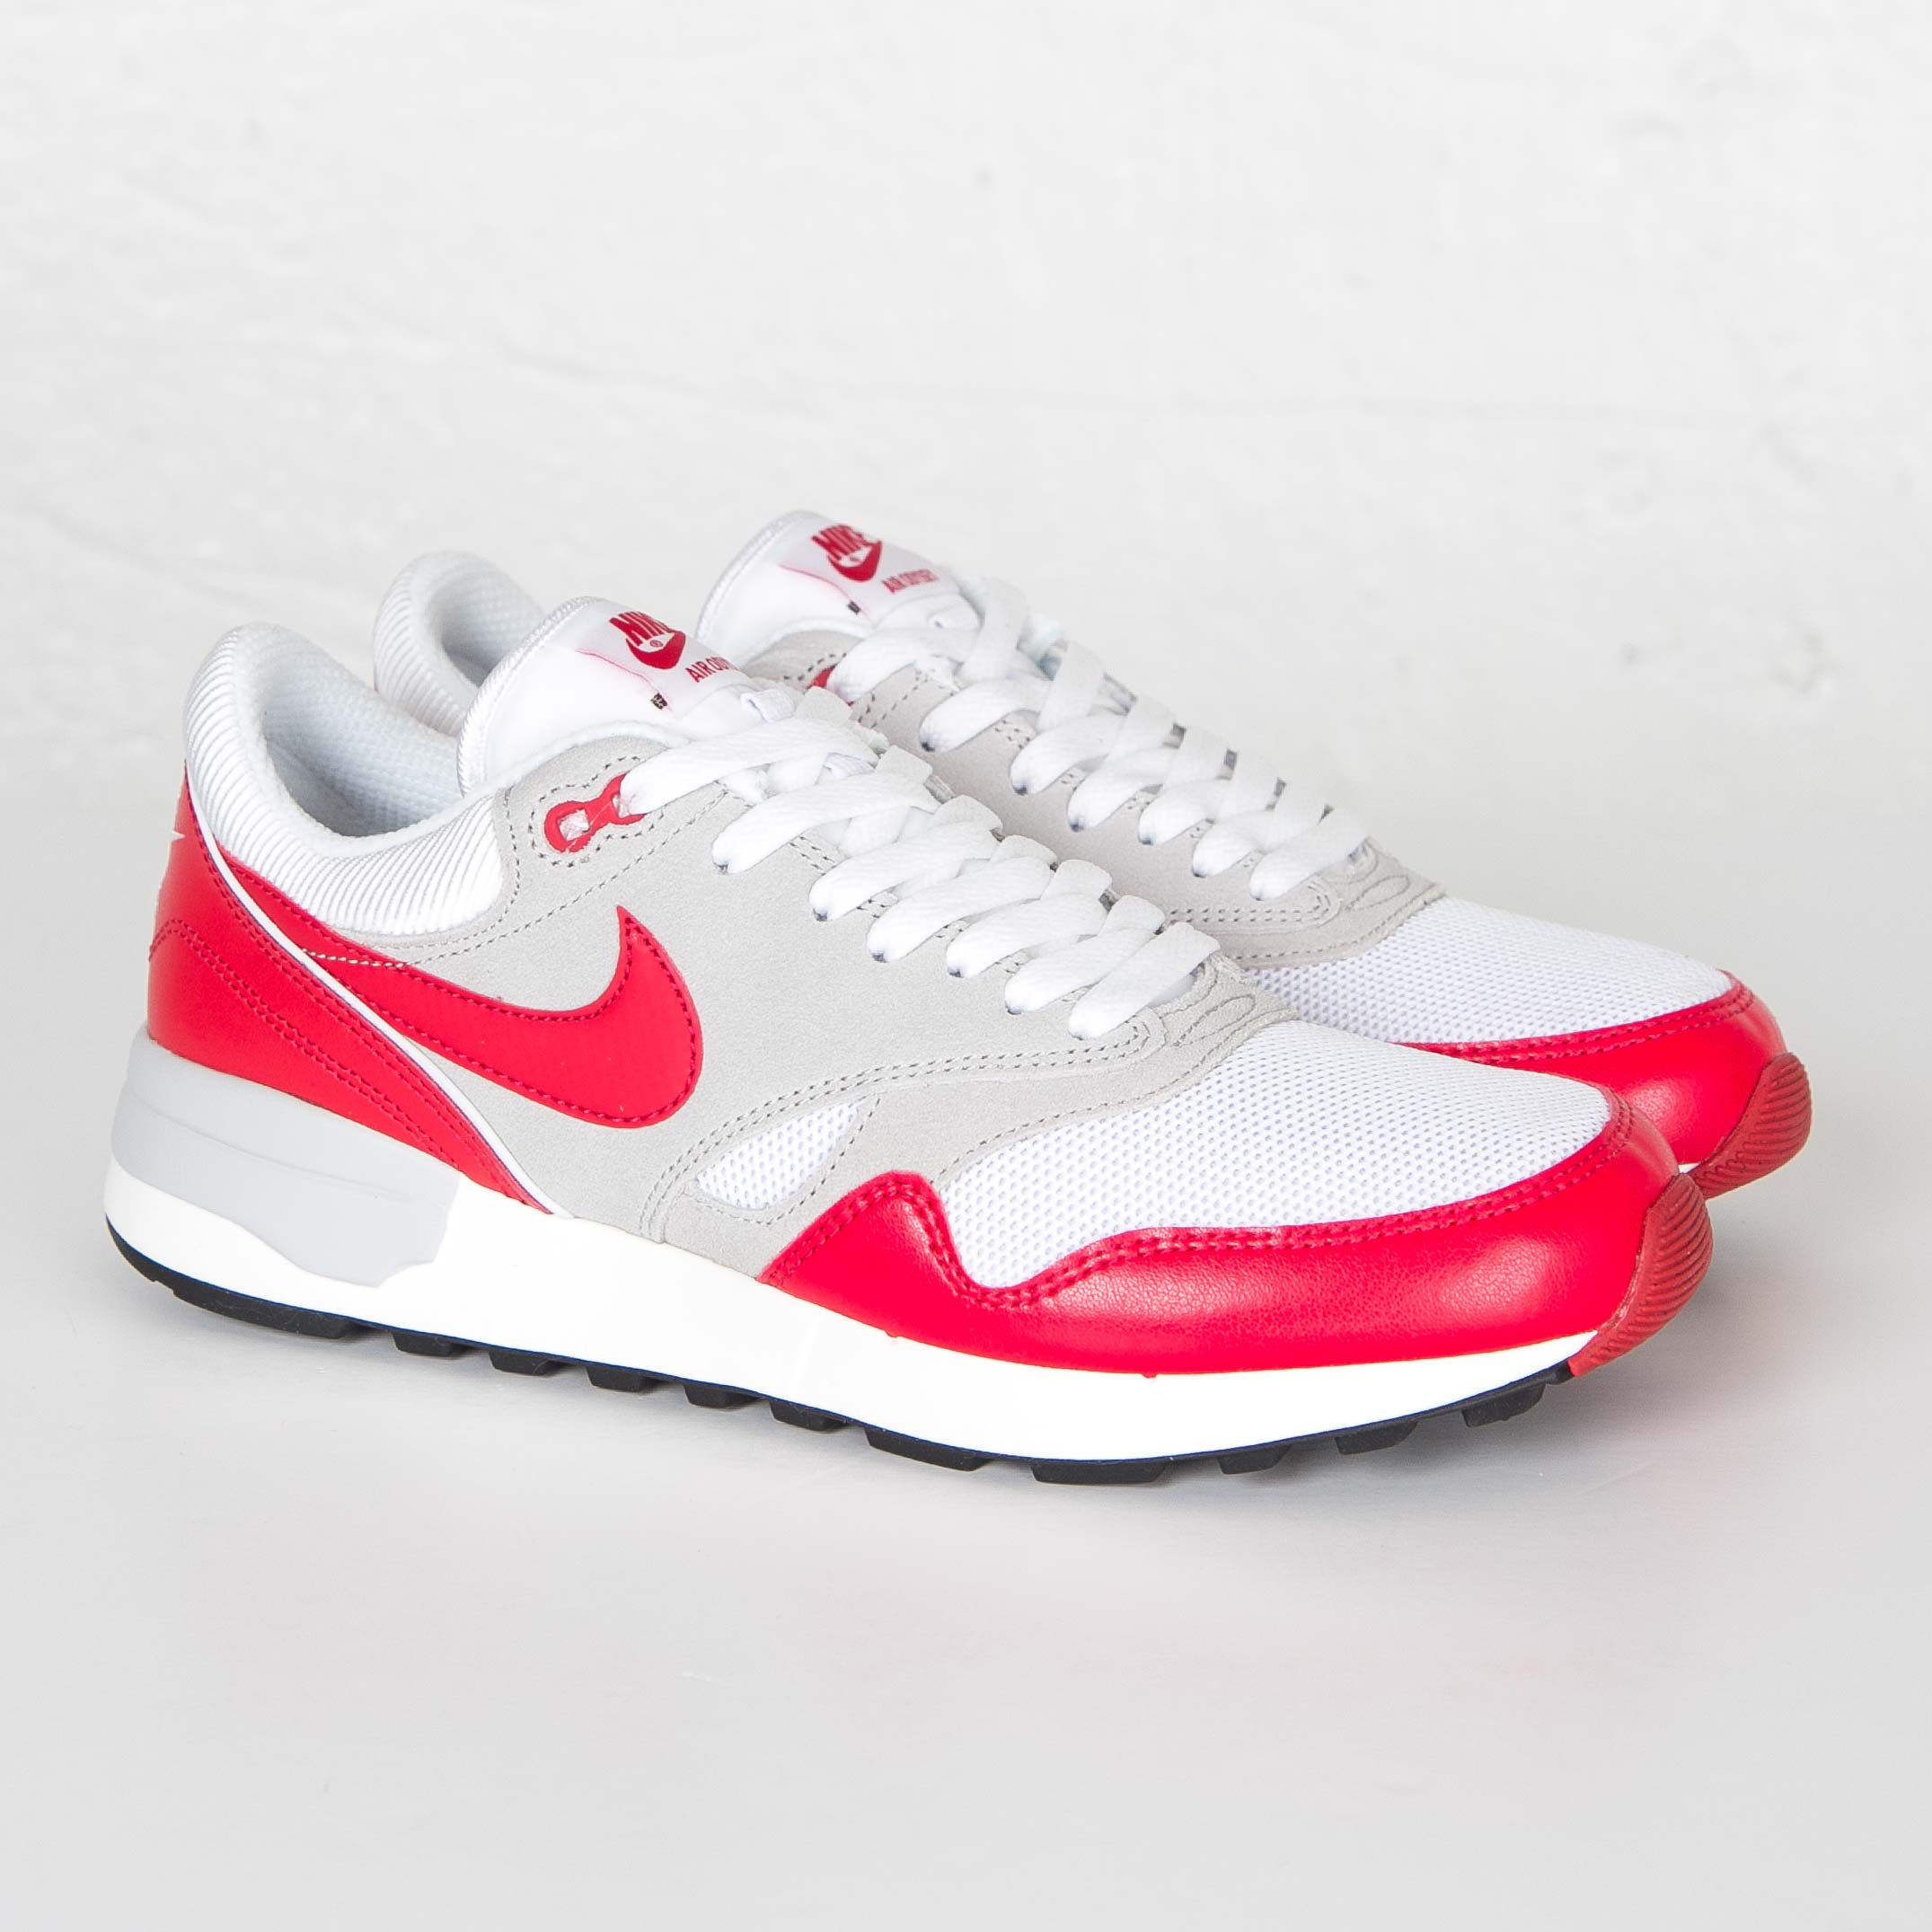 4e2b20144e Nike Air Odyssey - 652989-106 - Sneakersnstuff   sneakers ...